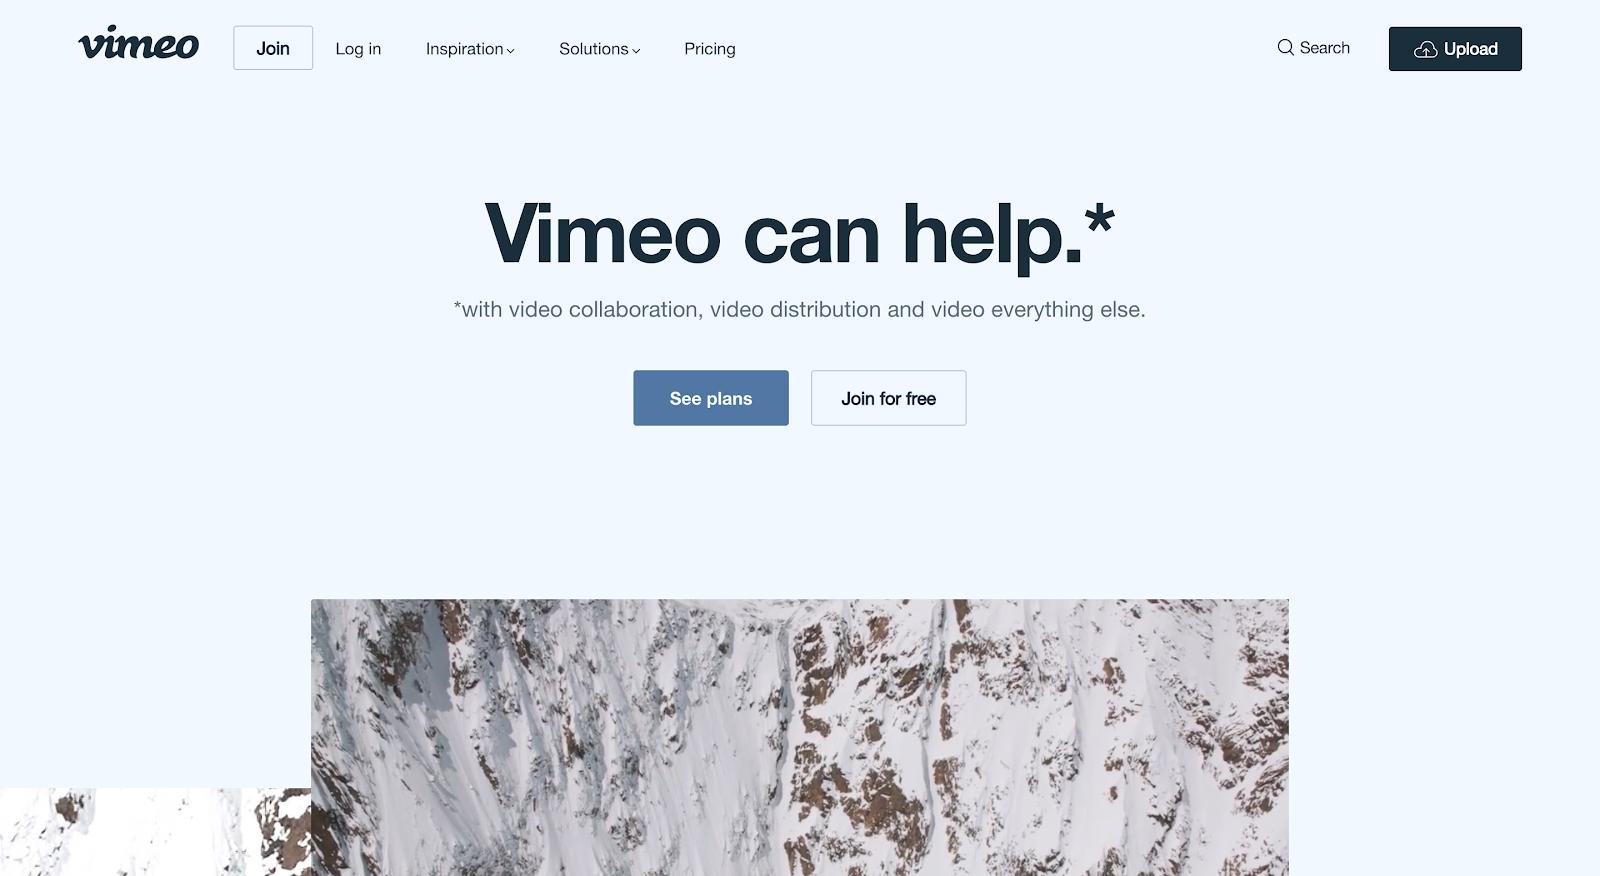 Vimeo video hosting